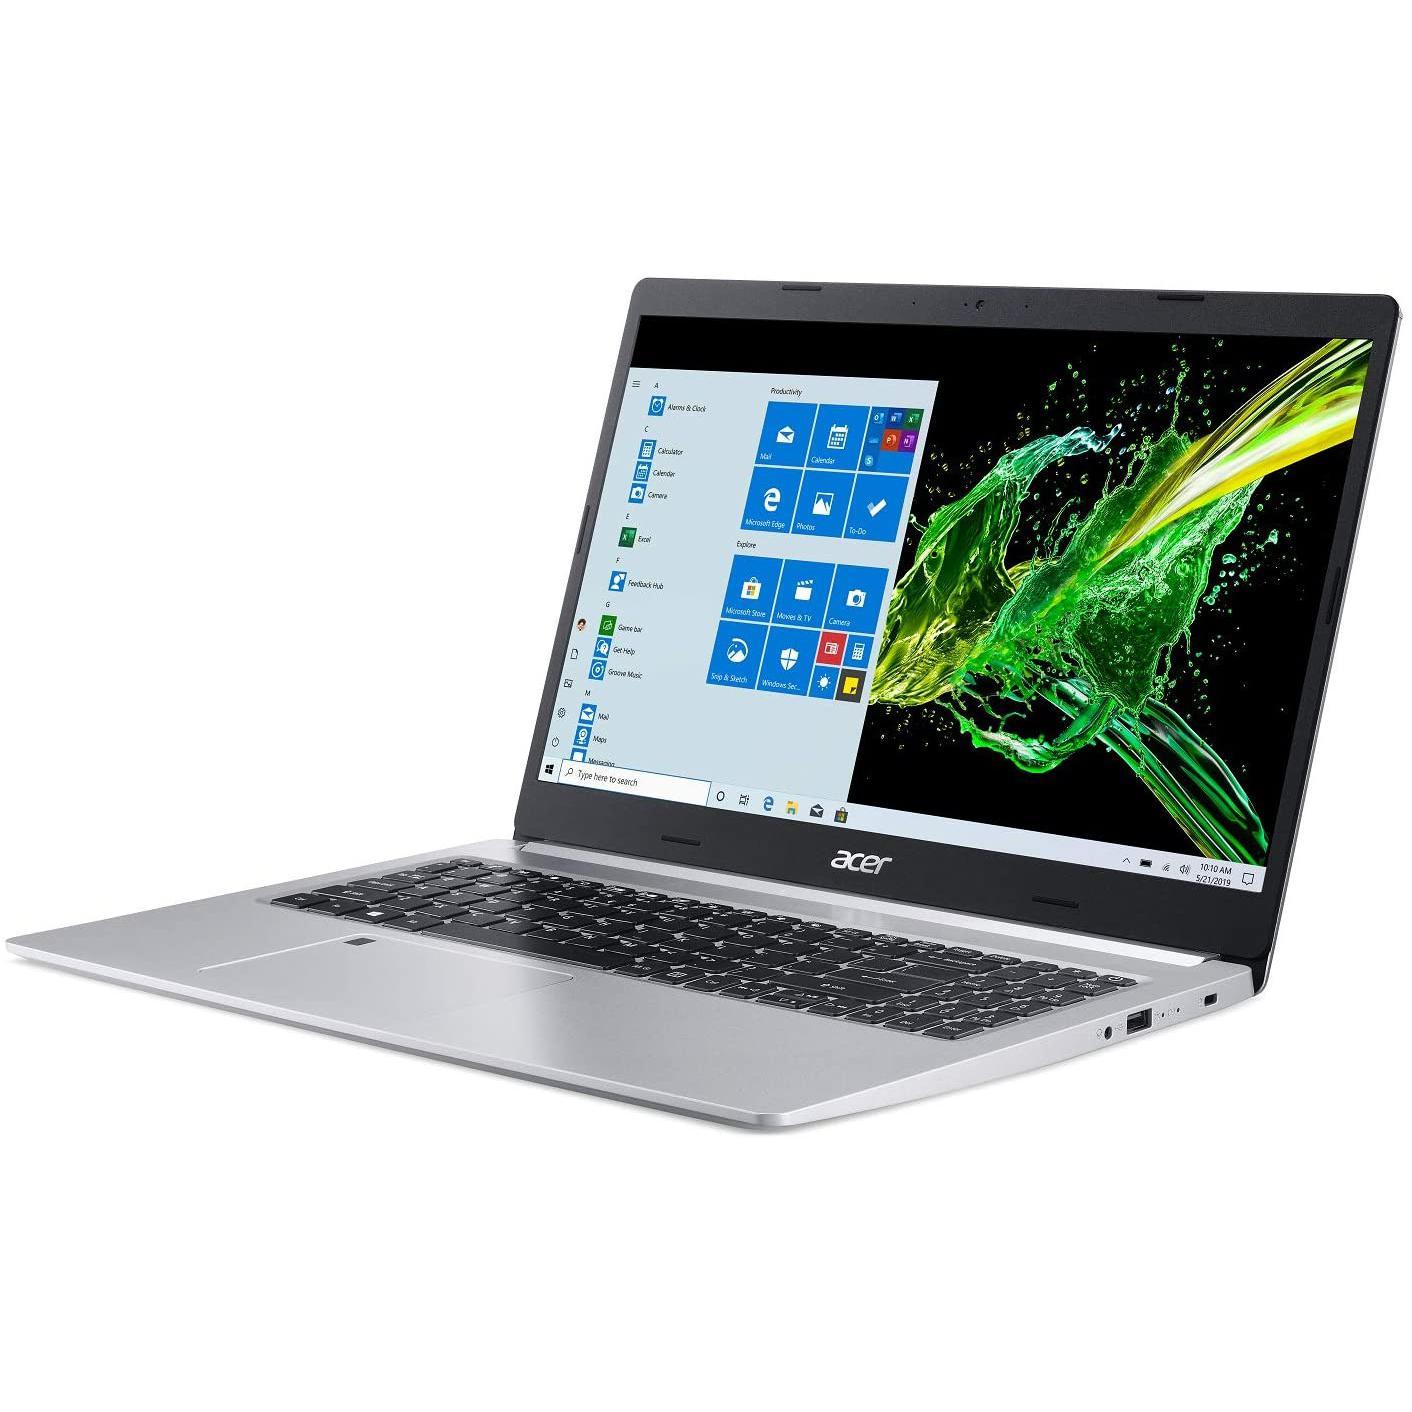 Acer Aspire 5 A515-55-35SE 15.6-inch (2020) - Core i3-1005G1 - 4 GB - SSD 128 GB